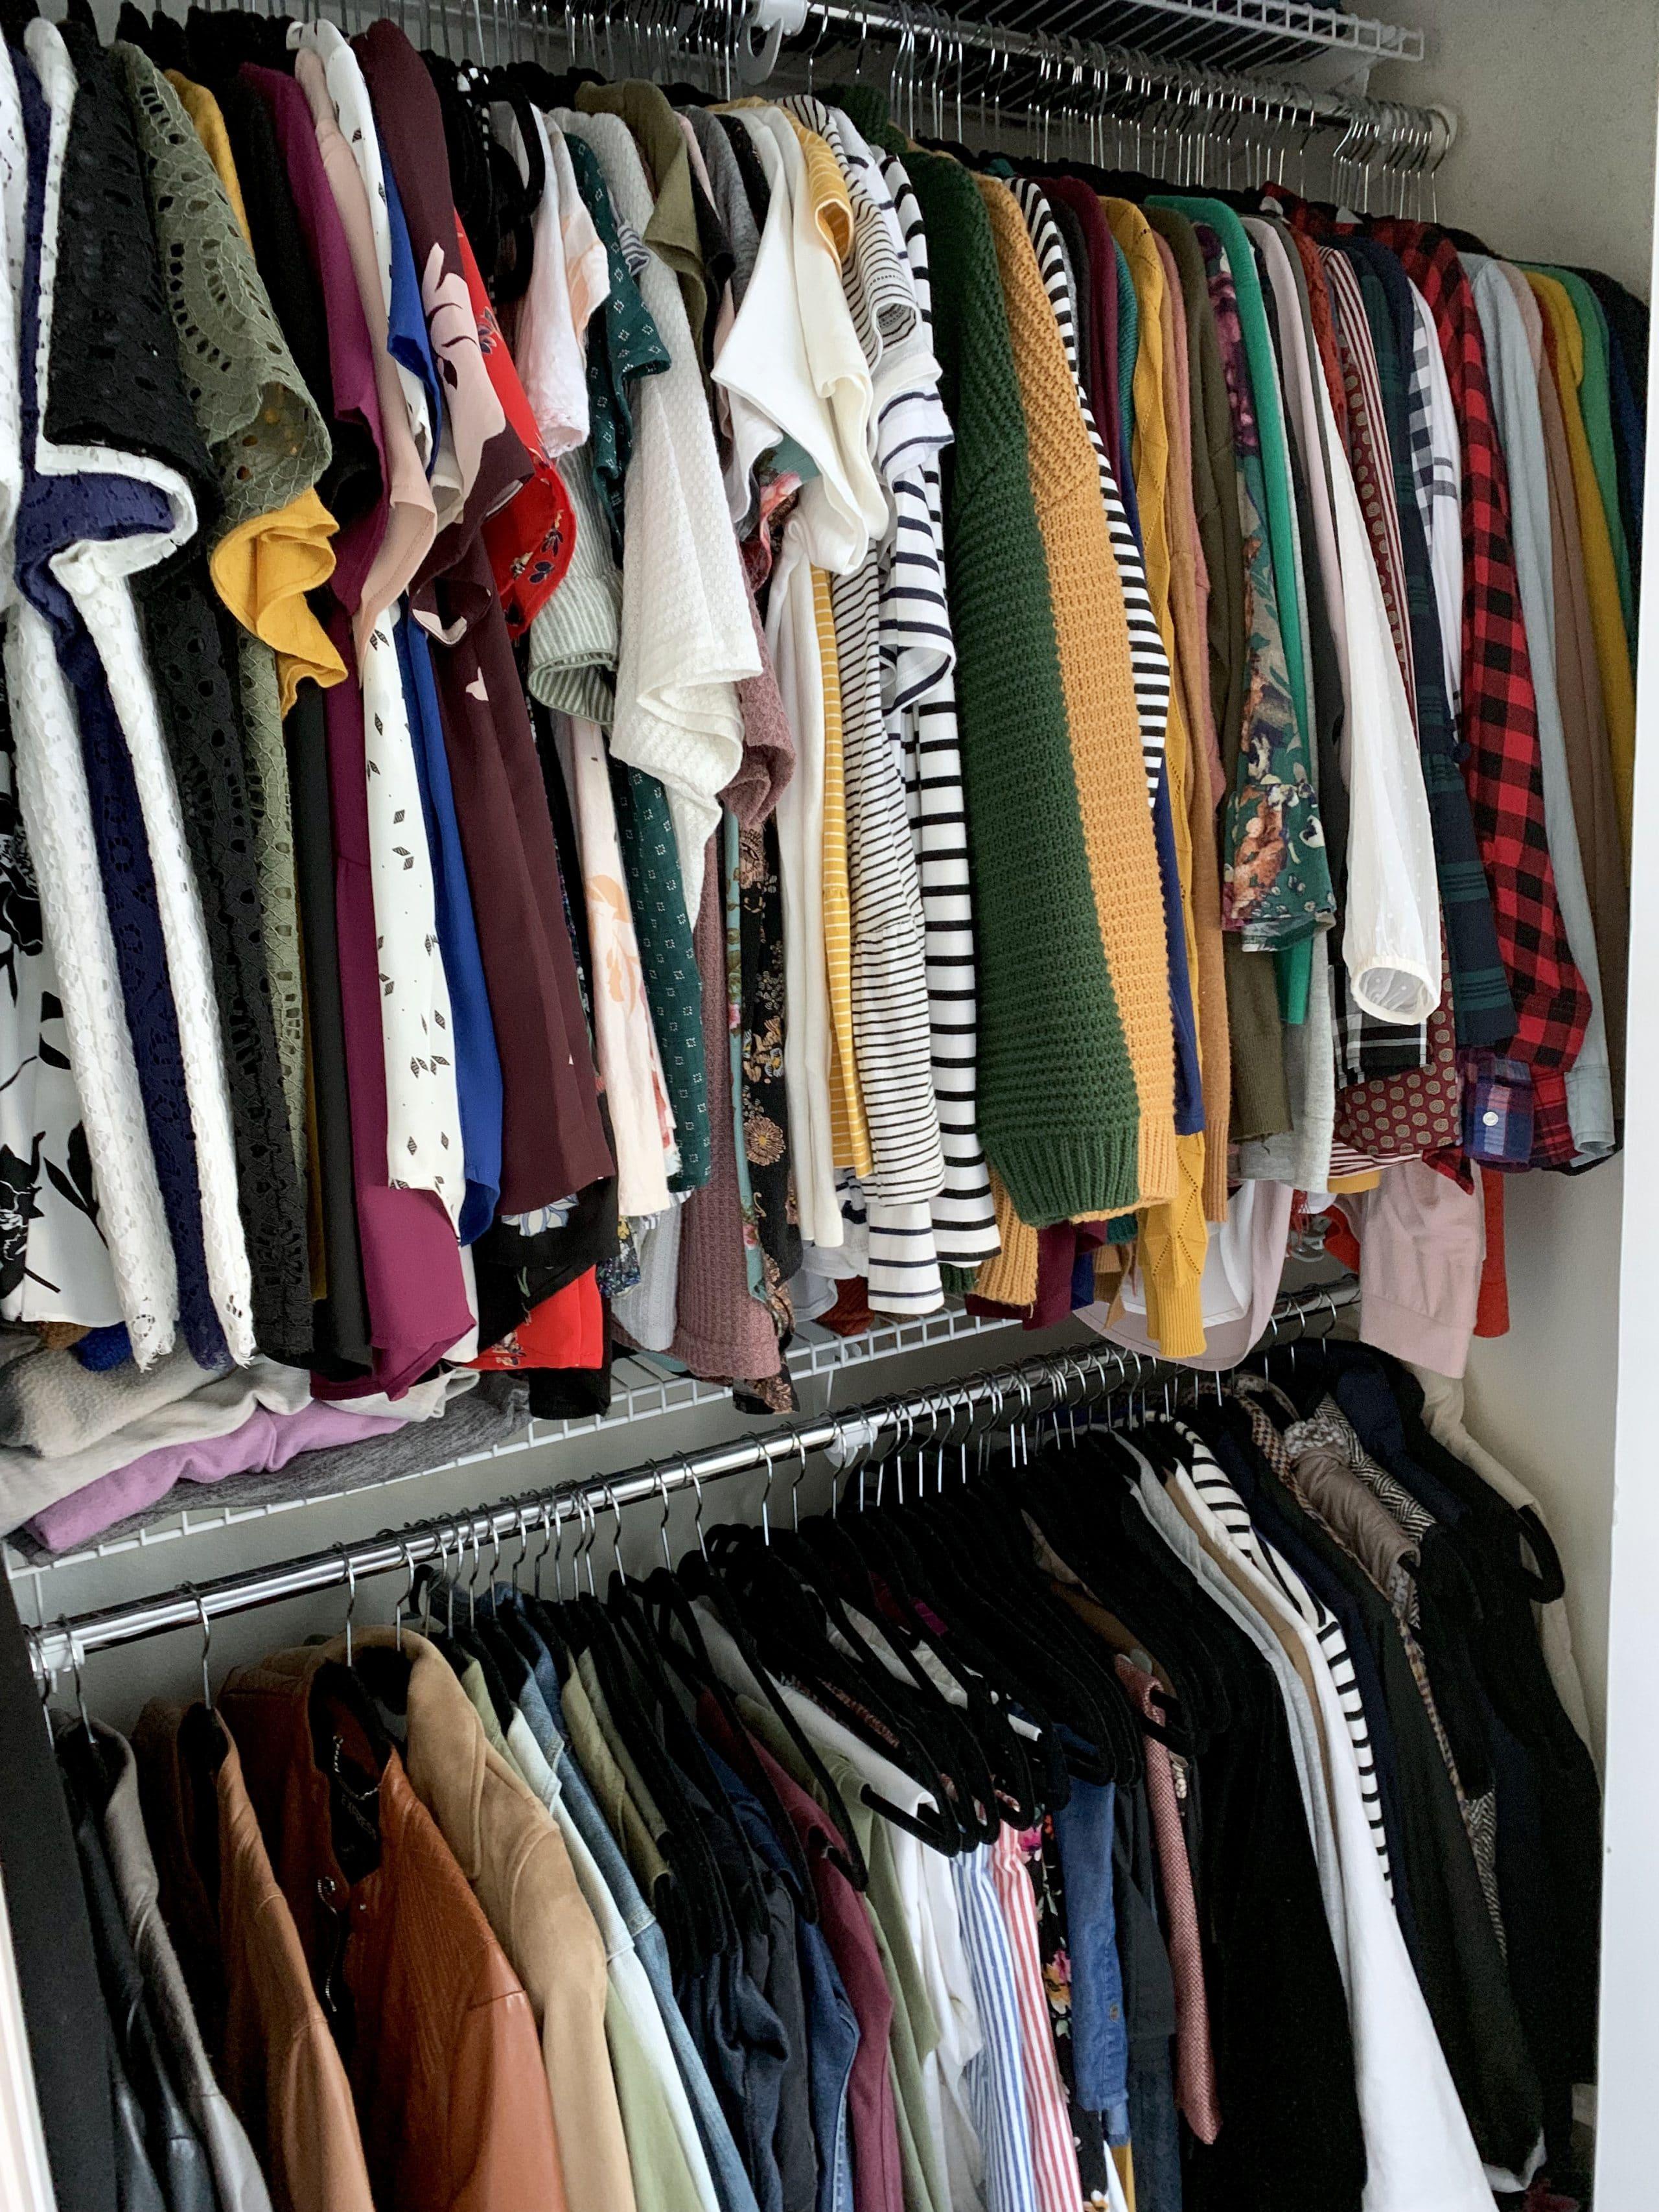 Inside Audrey's Closet